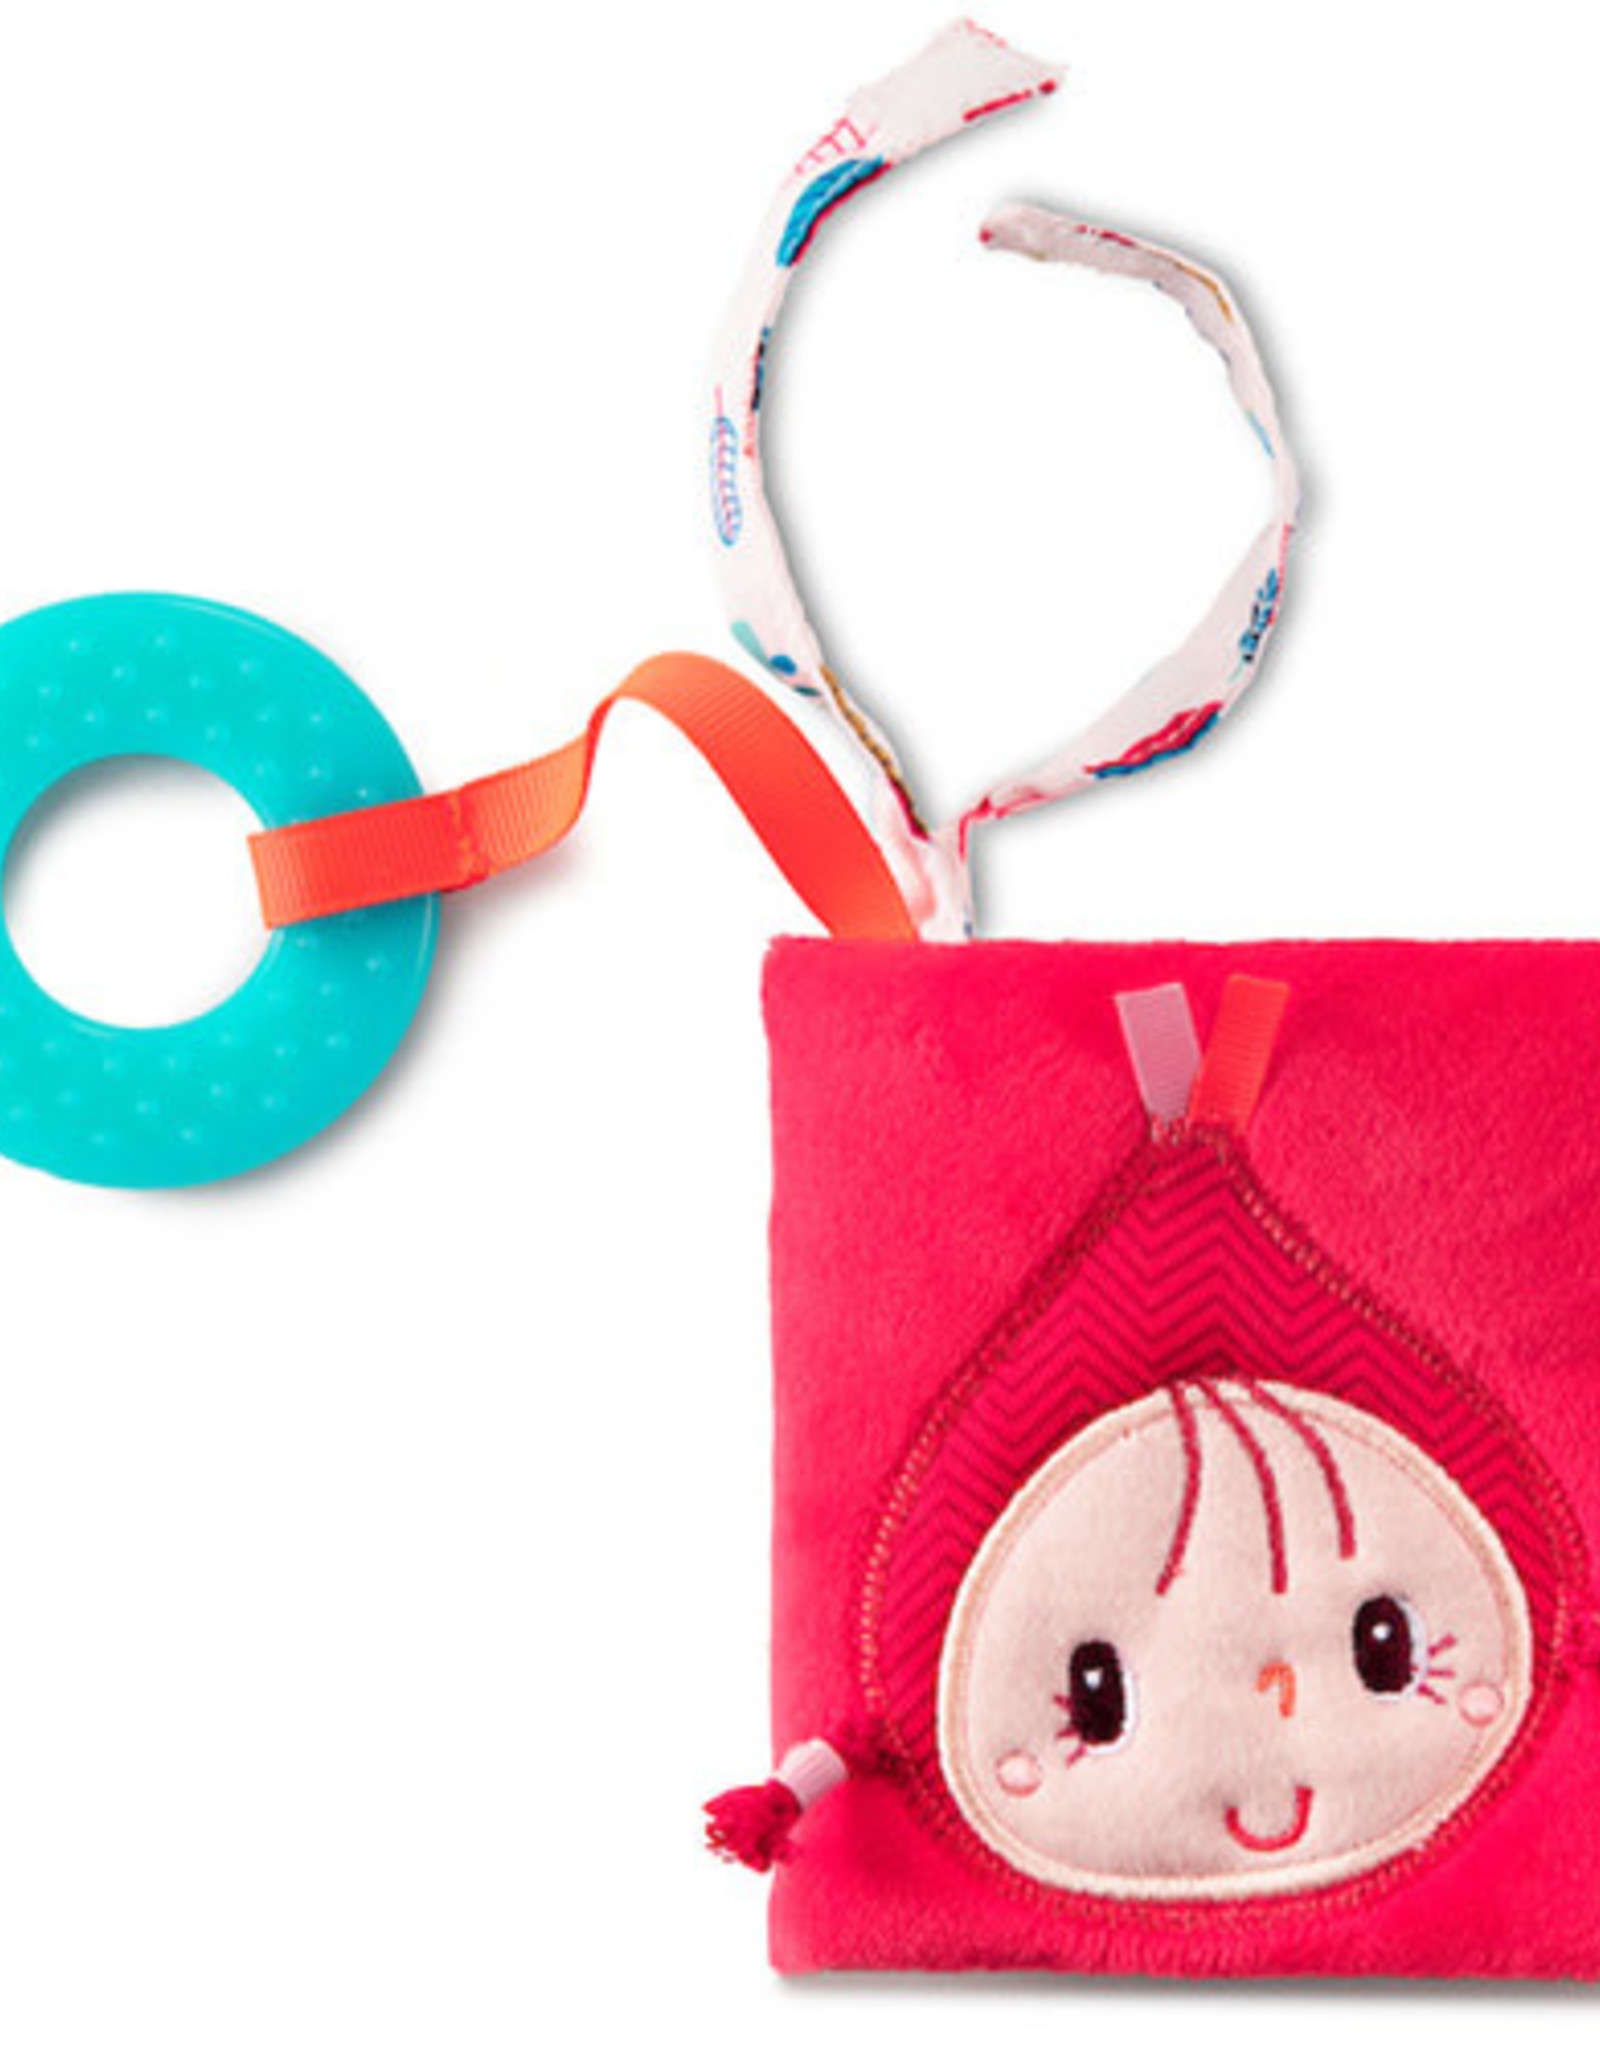 Lilliputiens Kijk- en speelboek Roodkapje